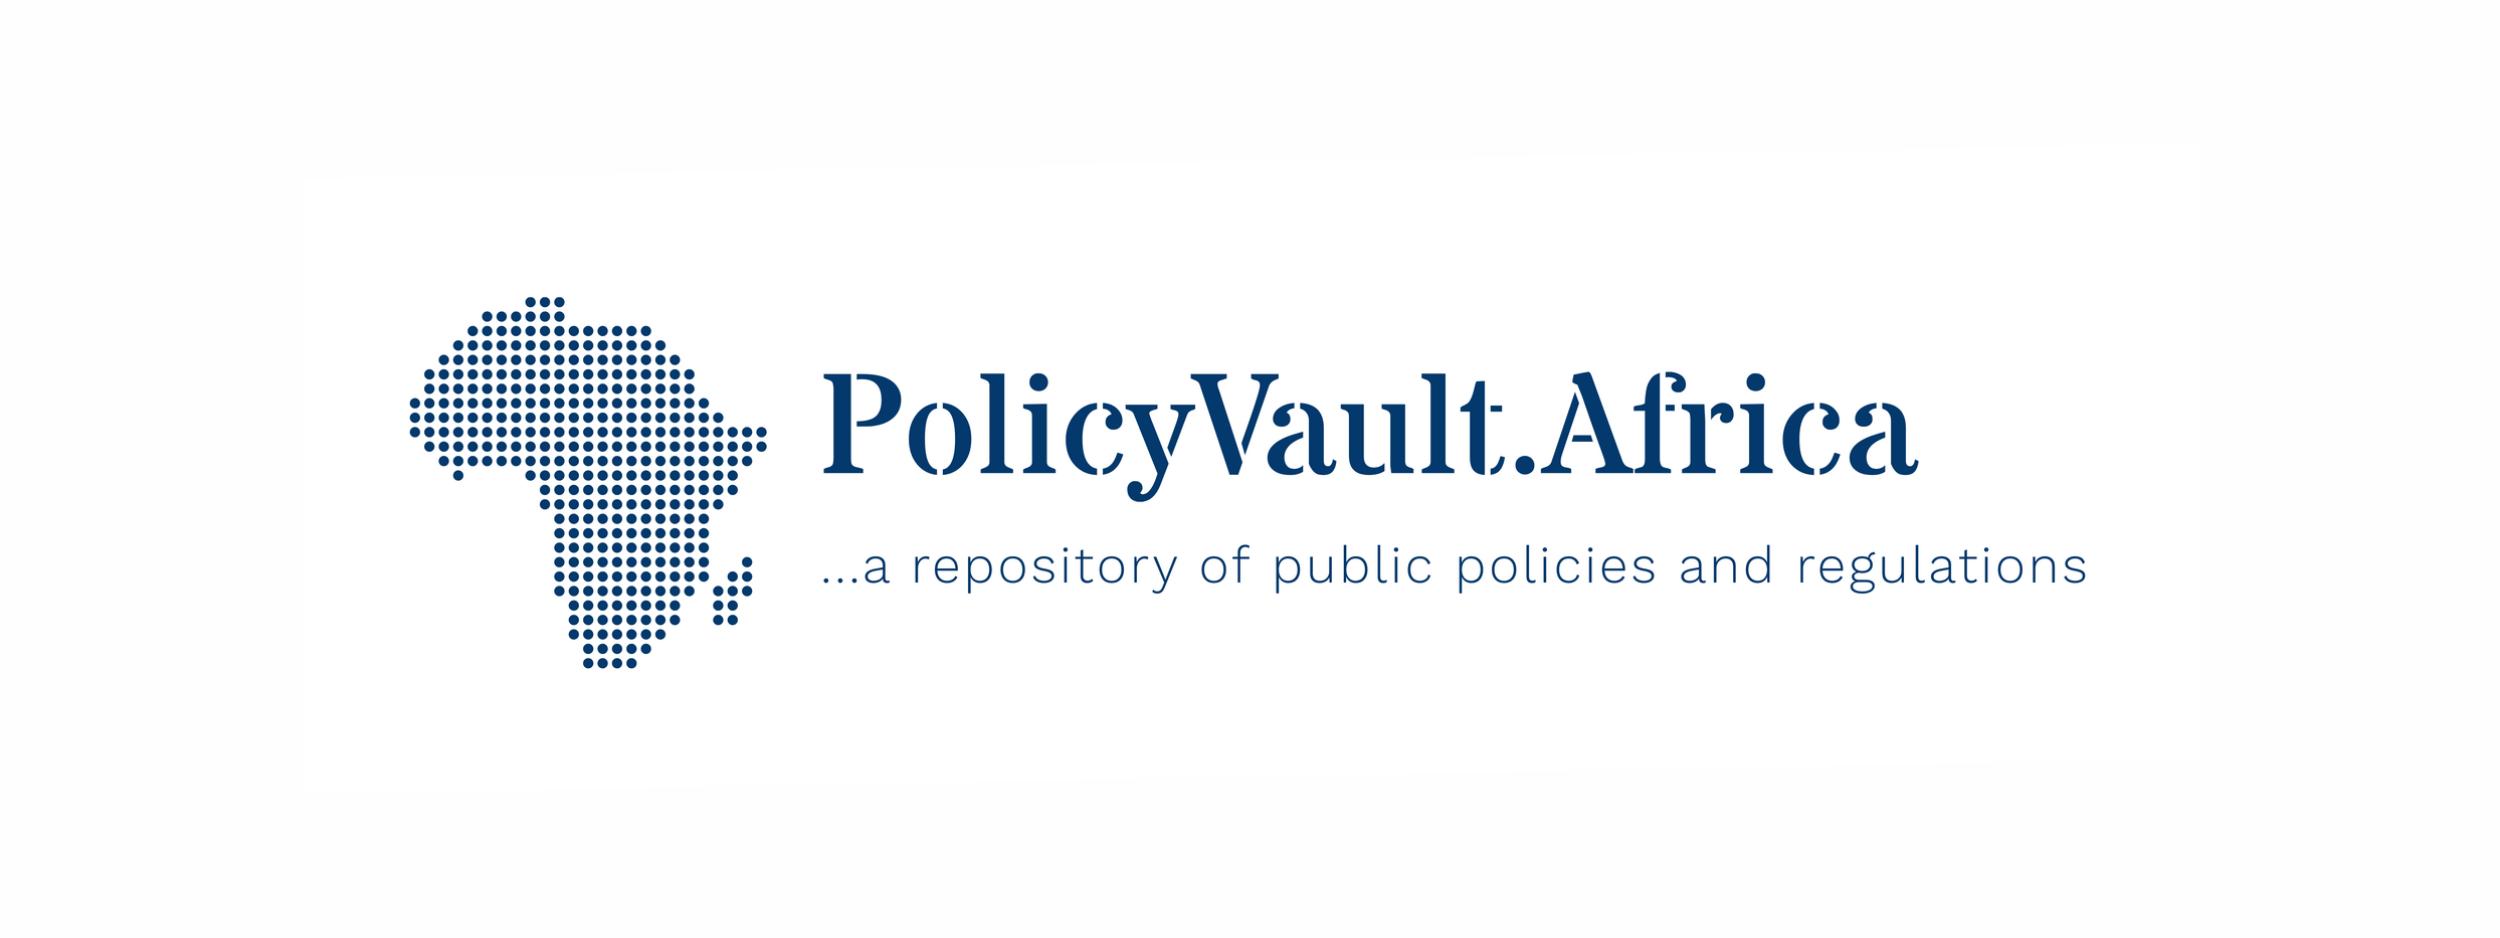 policy vault2